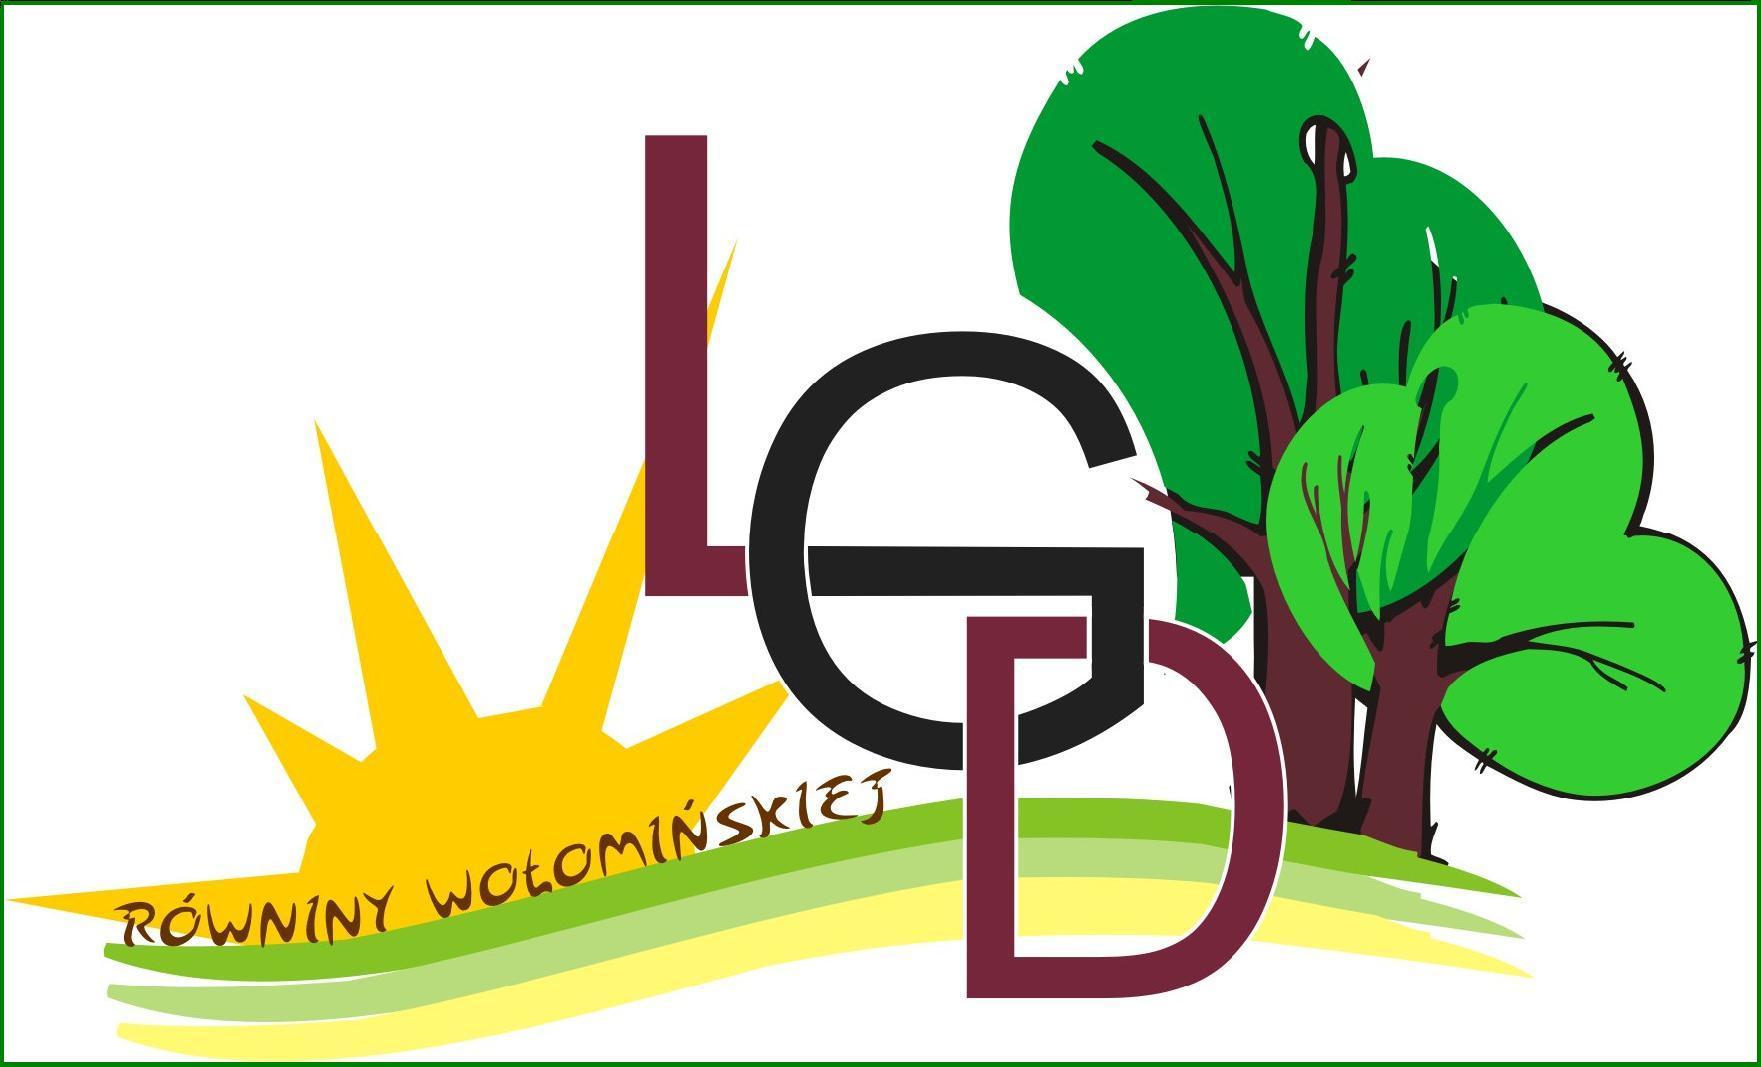 http://www.lgdrw.pl/nowa/wp-content/files/lgd_logo1.jpg